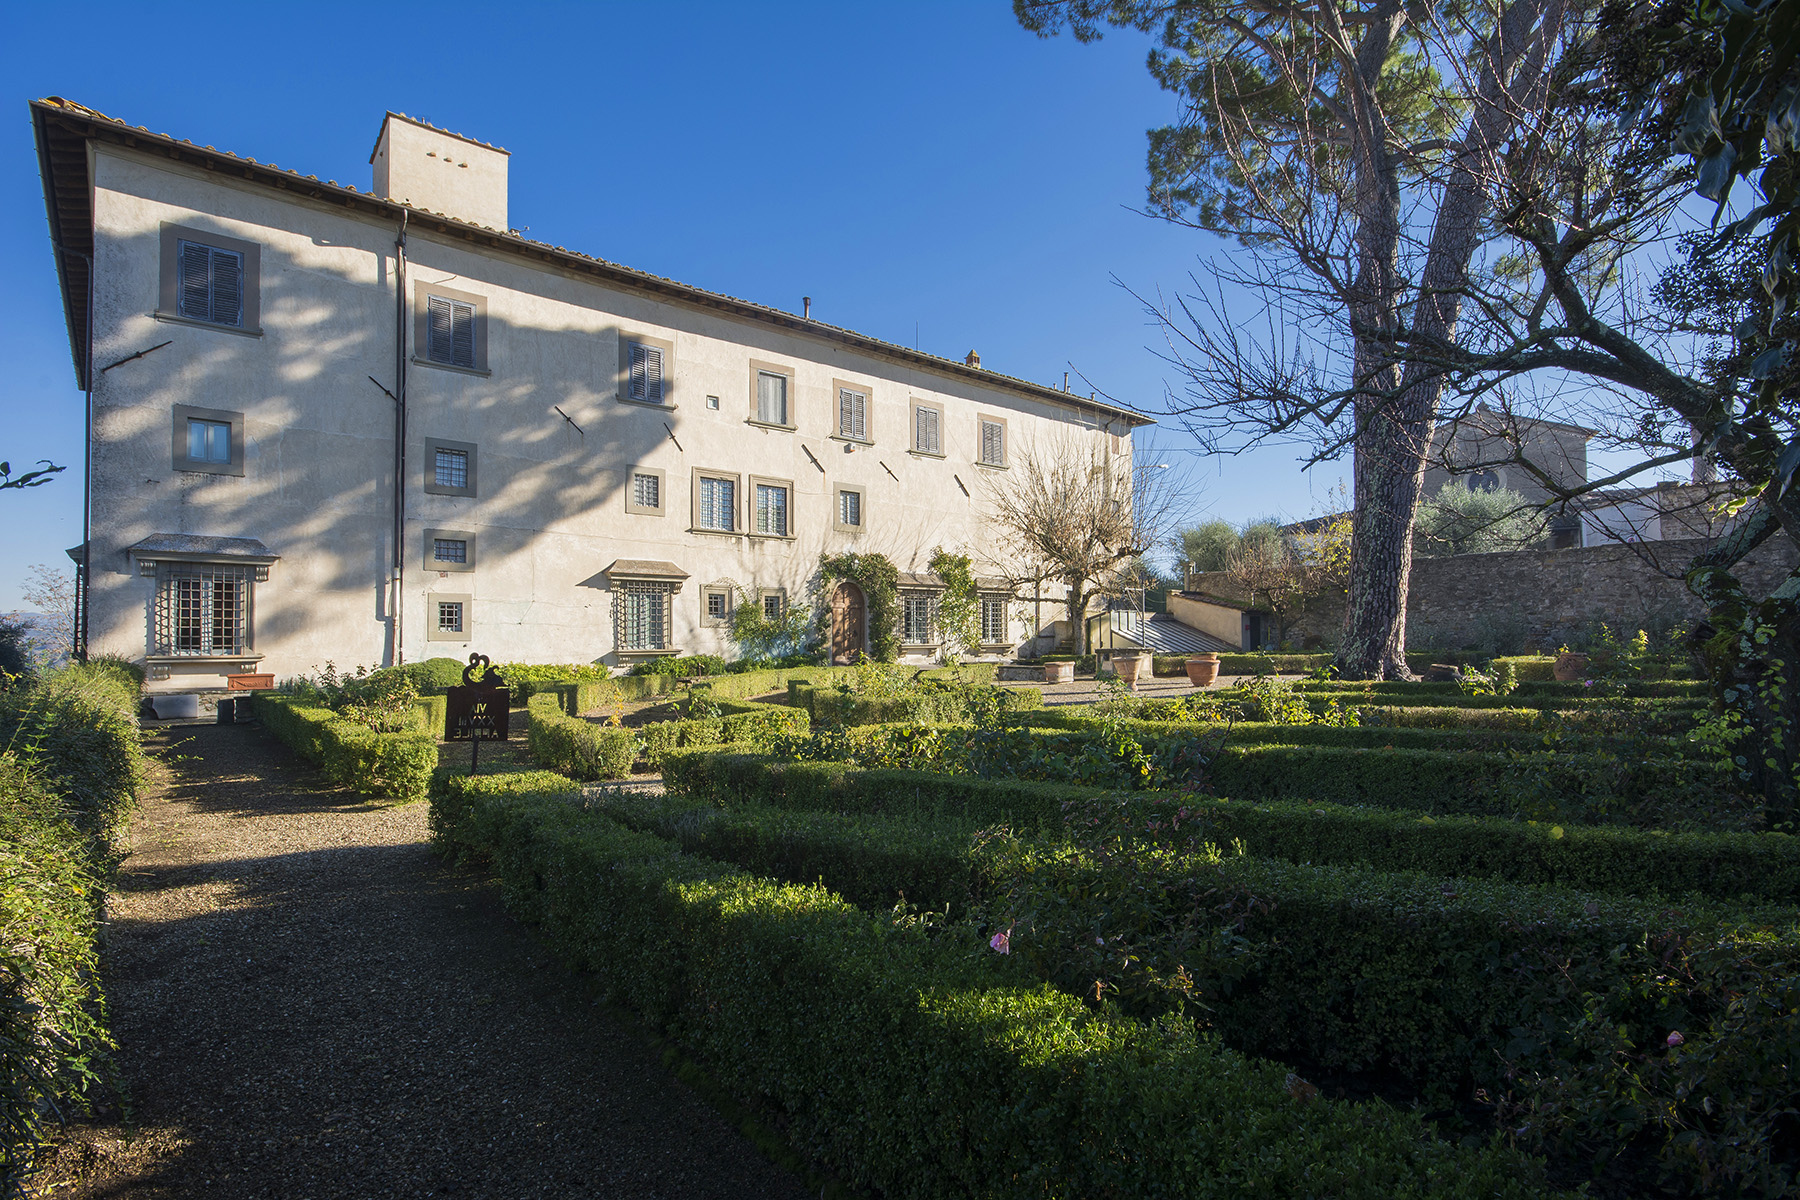 Villa in Affitto a Impruneta via senese